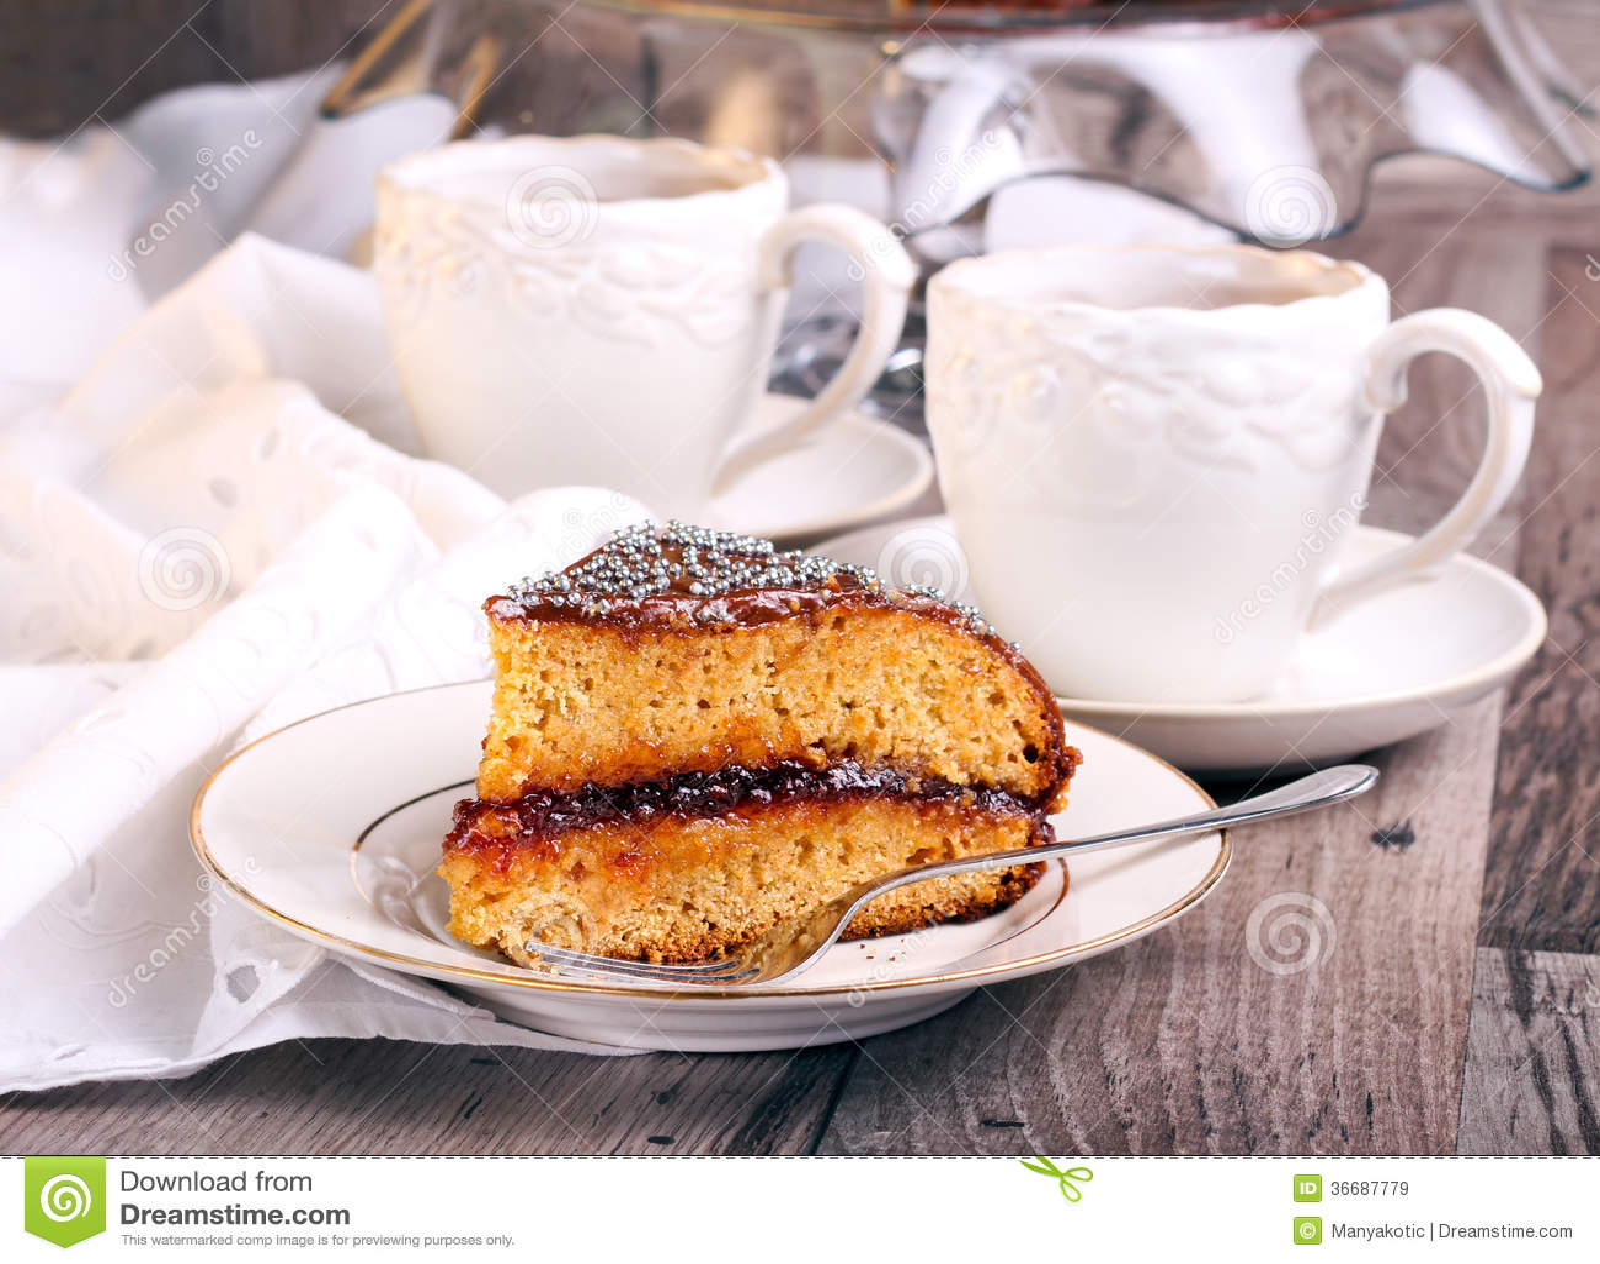 Glazed Chocolate Layer Cake Recipes — Dishmaps